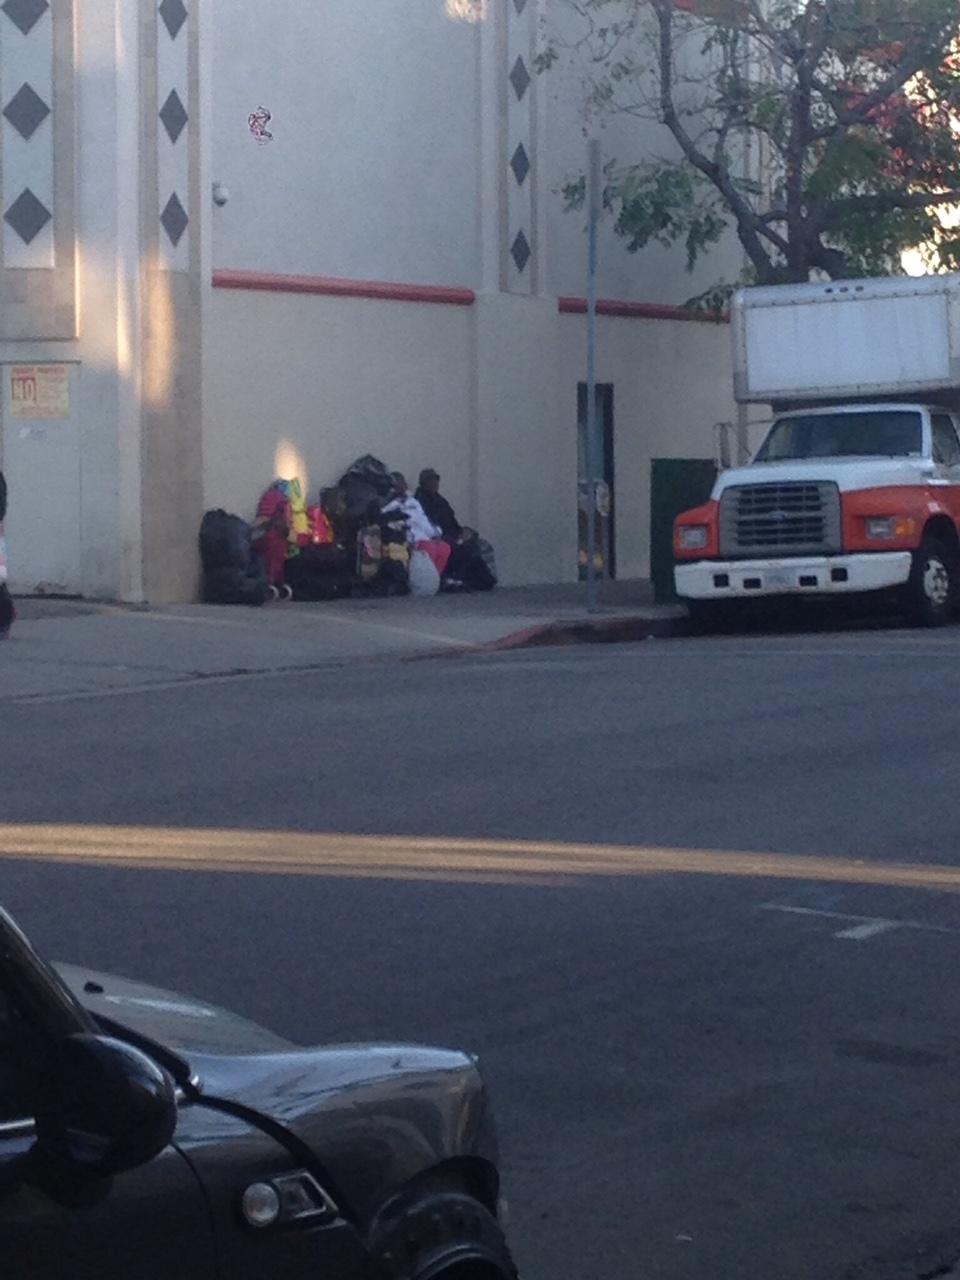 Hollywood Homelessness